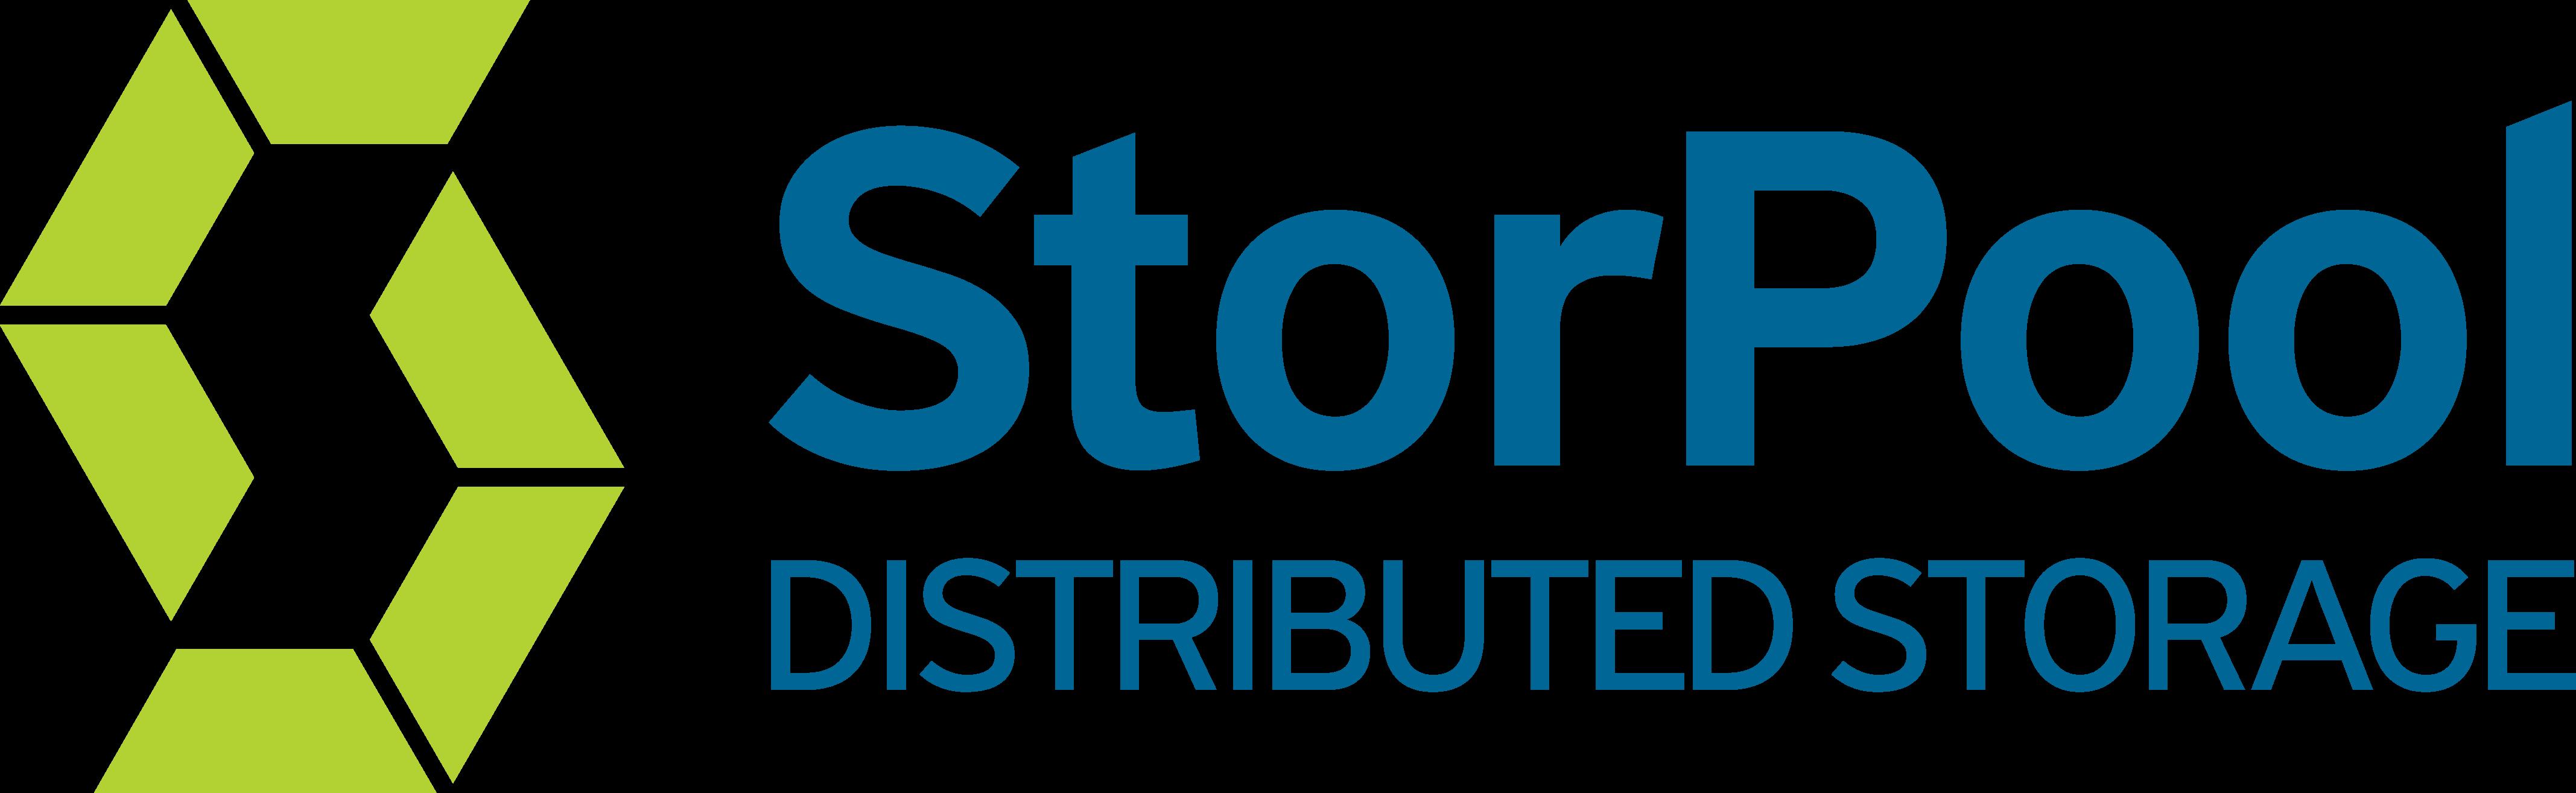 storpool logo blue big